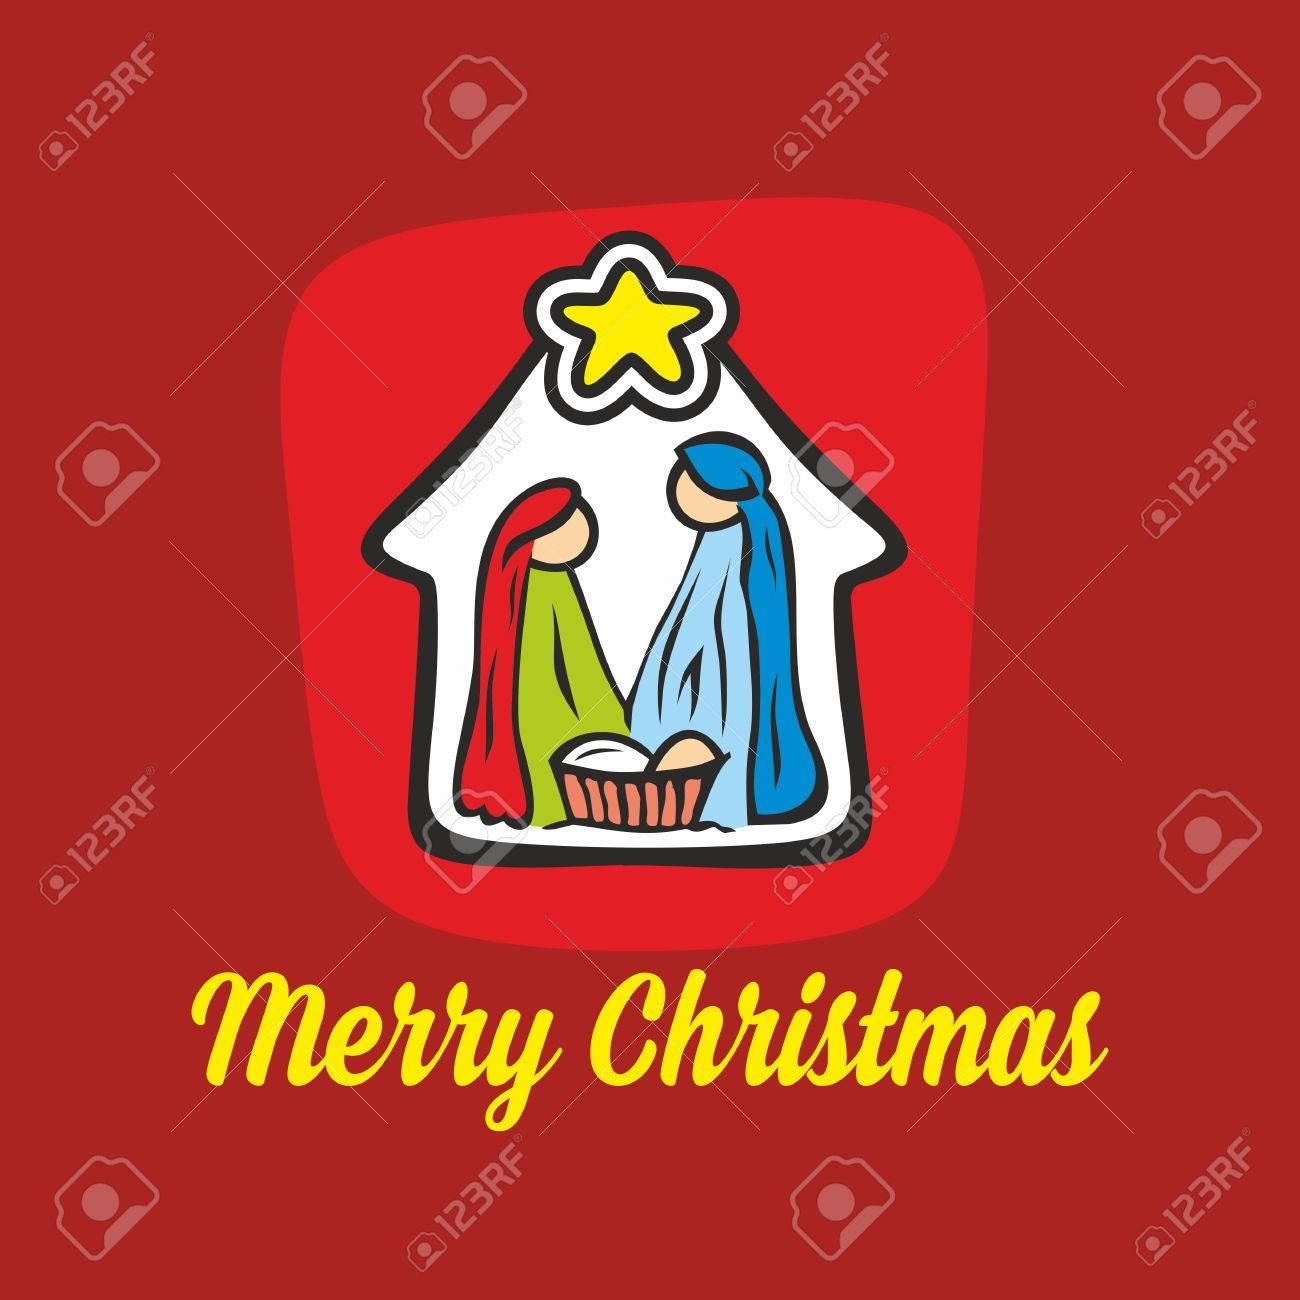 1300x1300 Merry Christmas. Nativity Scene Royalty Free Cliparts, Vectors